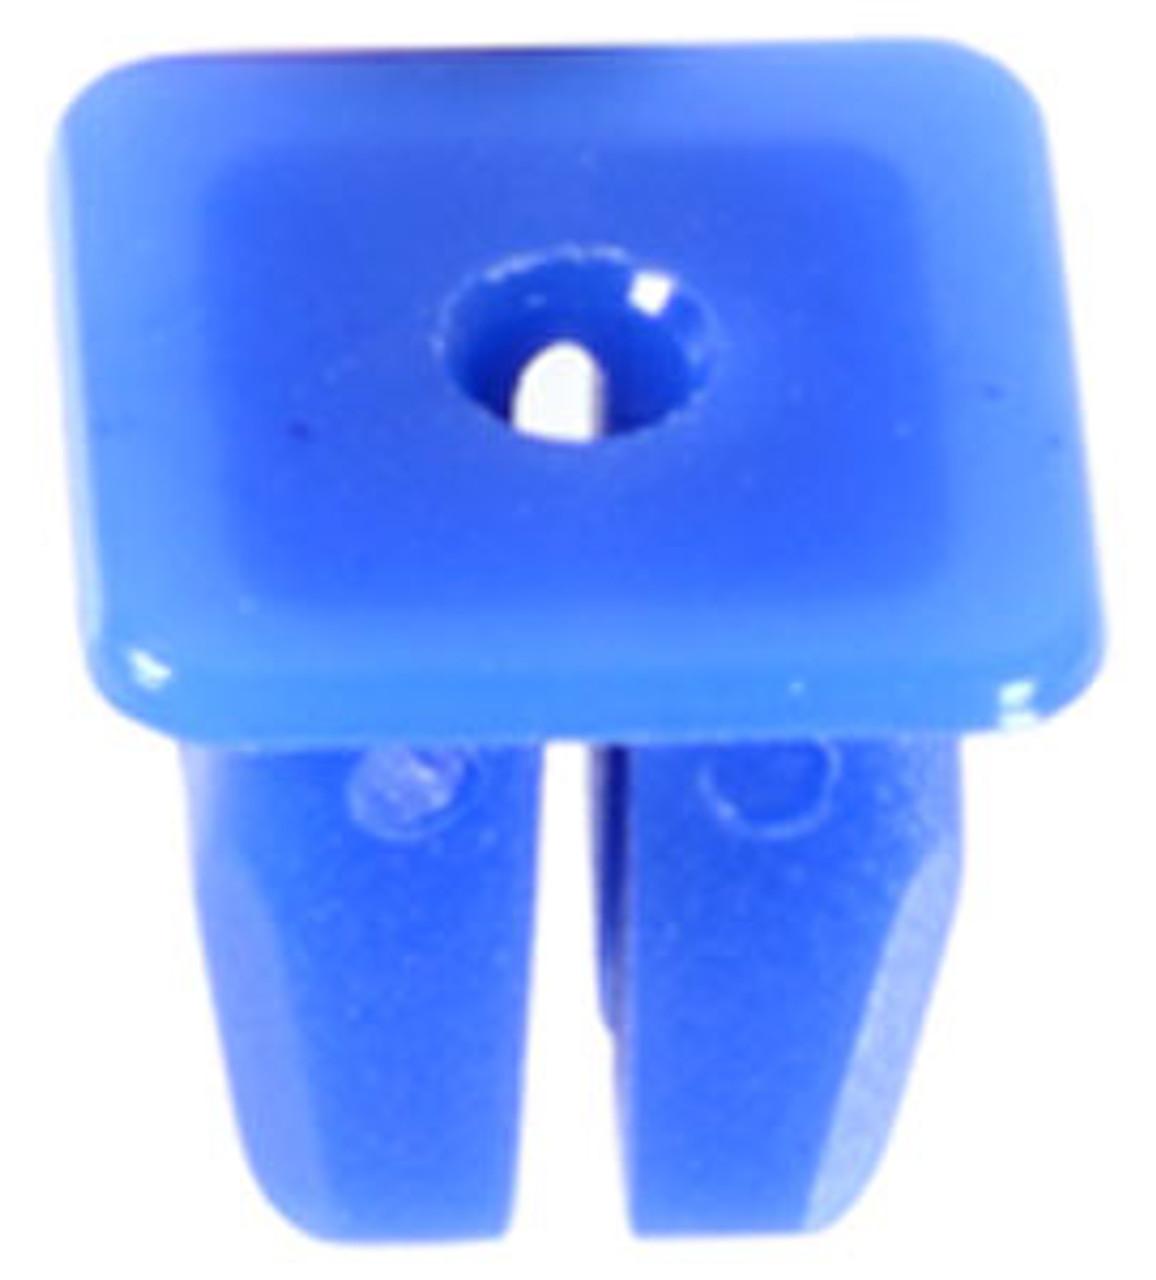 Nylon Nut Screw Size: M3.5 (#6) Head Size: 11mm x 11mm Stem Length: 10mm Fits Into 8mm x 8mm Square Hole Subaru 1993-On OEM# 62731-FA010 Blue Nylon 25 Per Box Click Next Image For Clip Detail